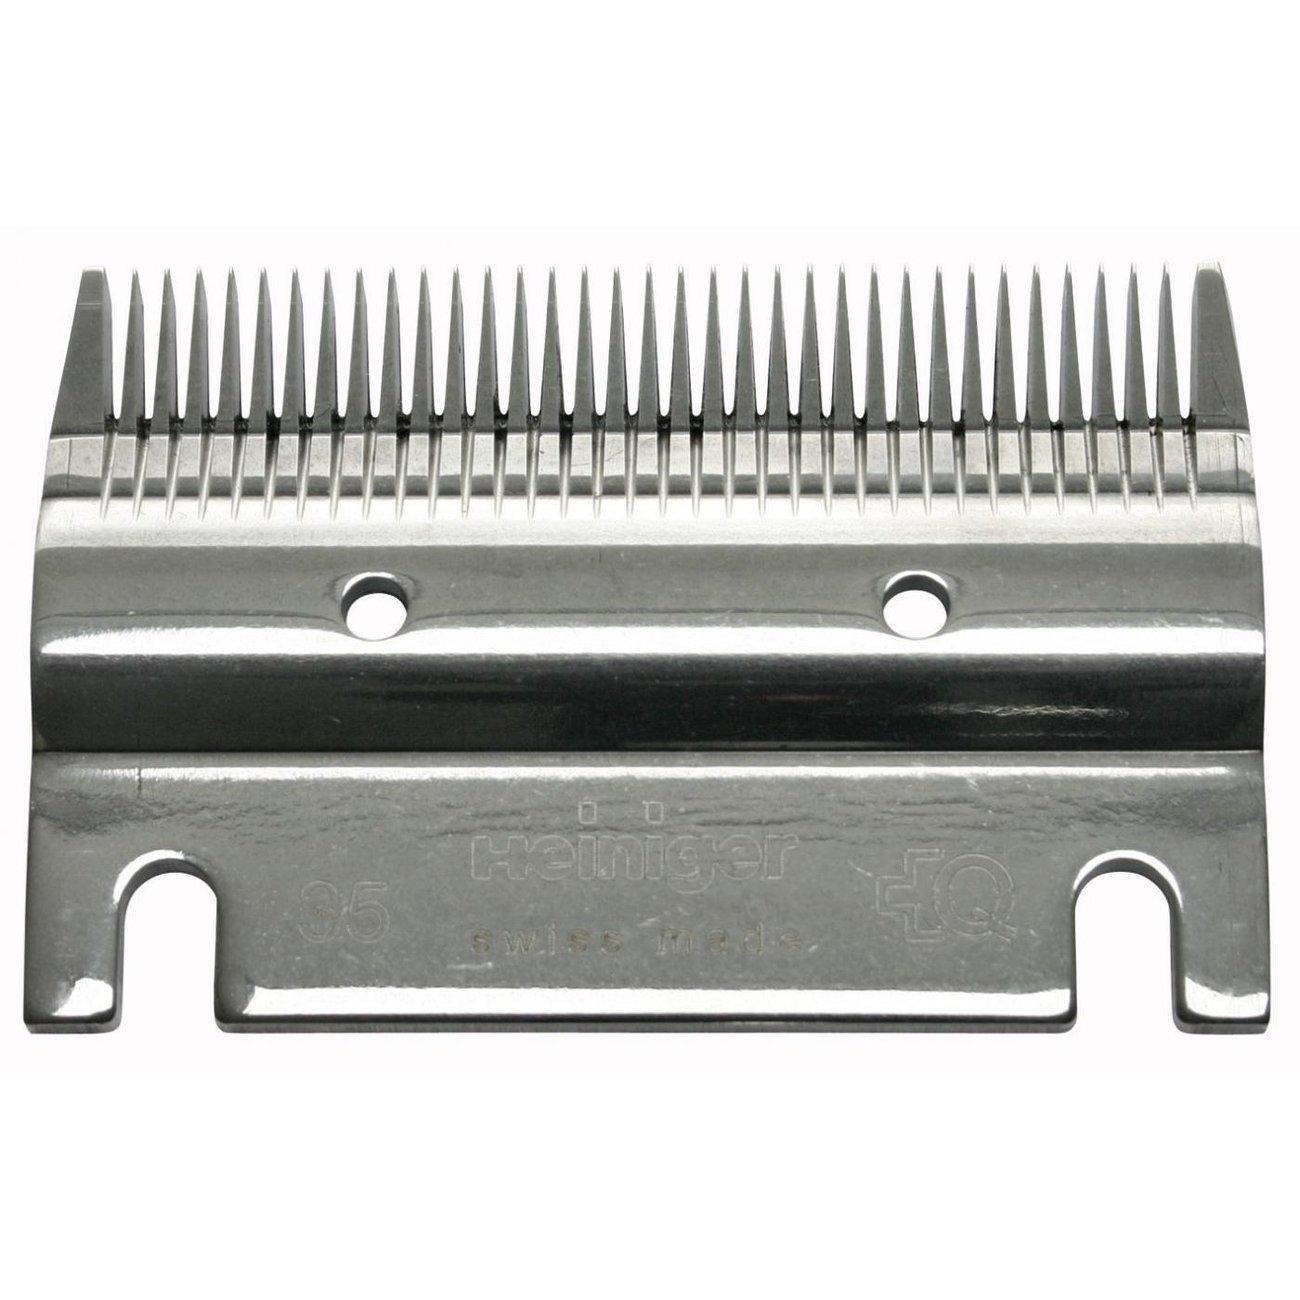 BUSSE Schermesser for all 35/17, 35/7